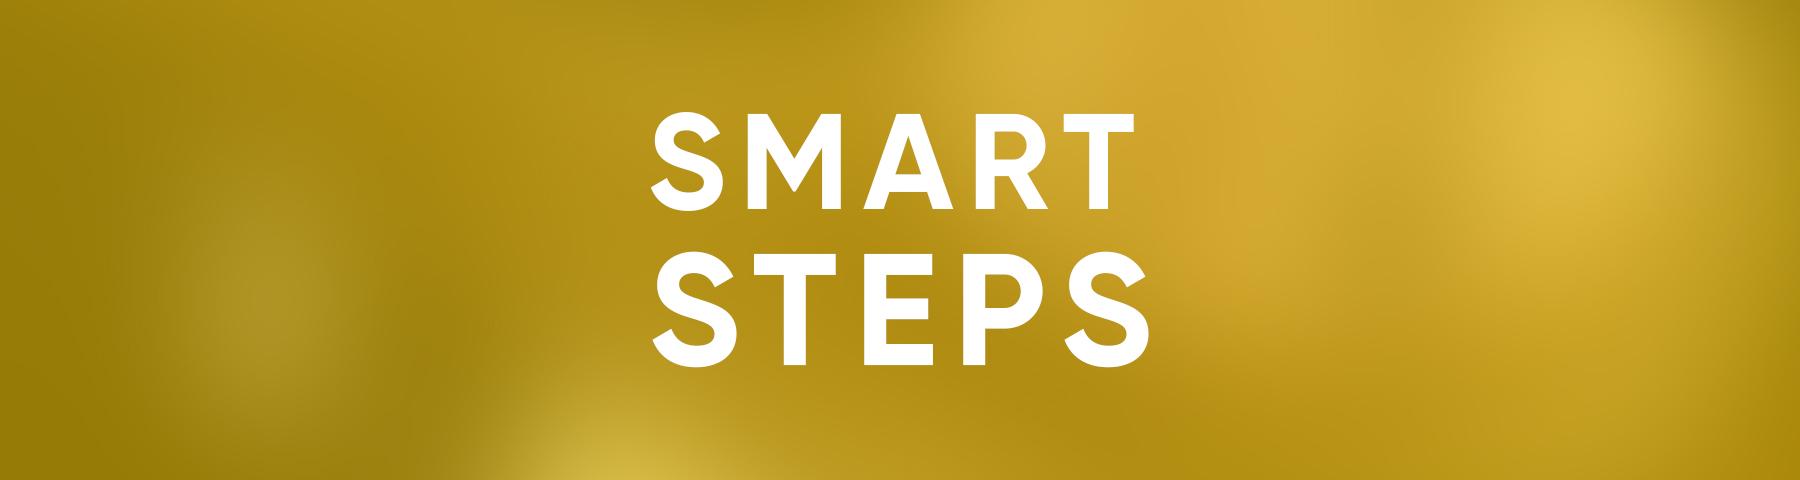 LIMACC_WEB_SMART STEPS BANNER.jpg